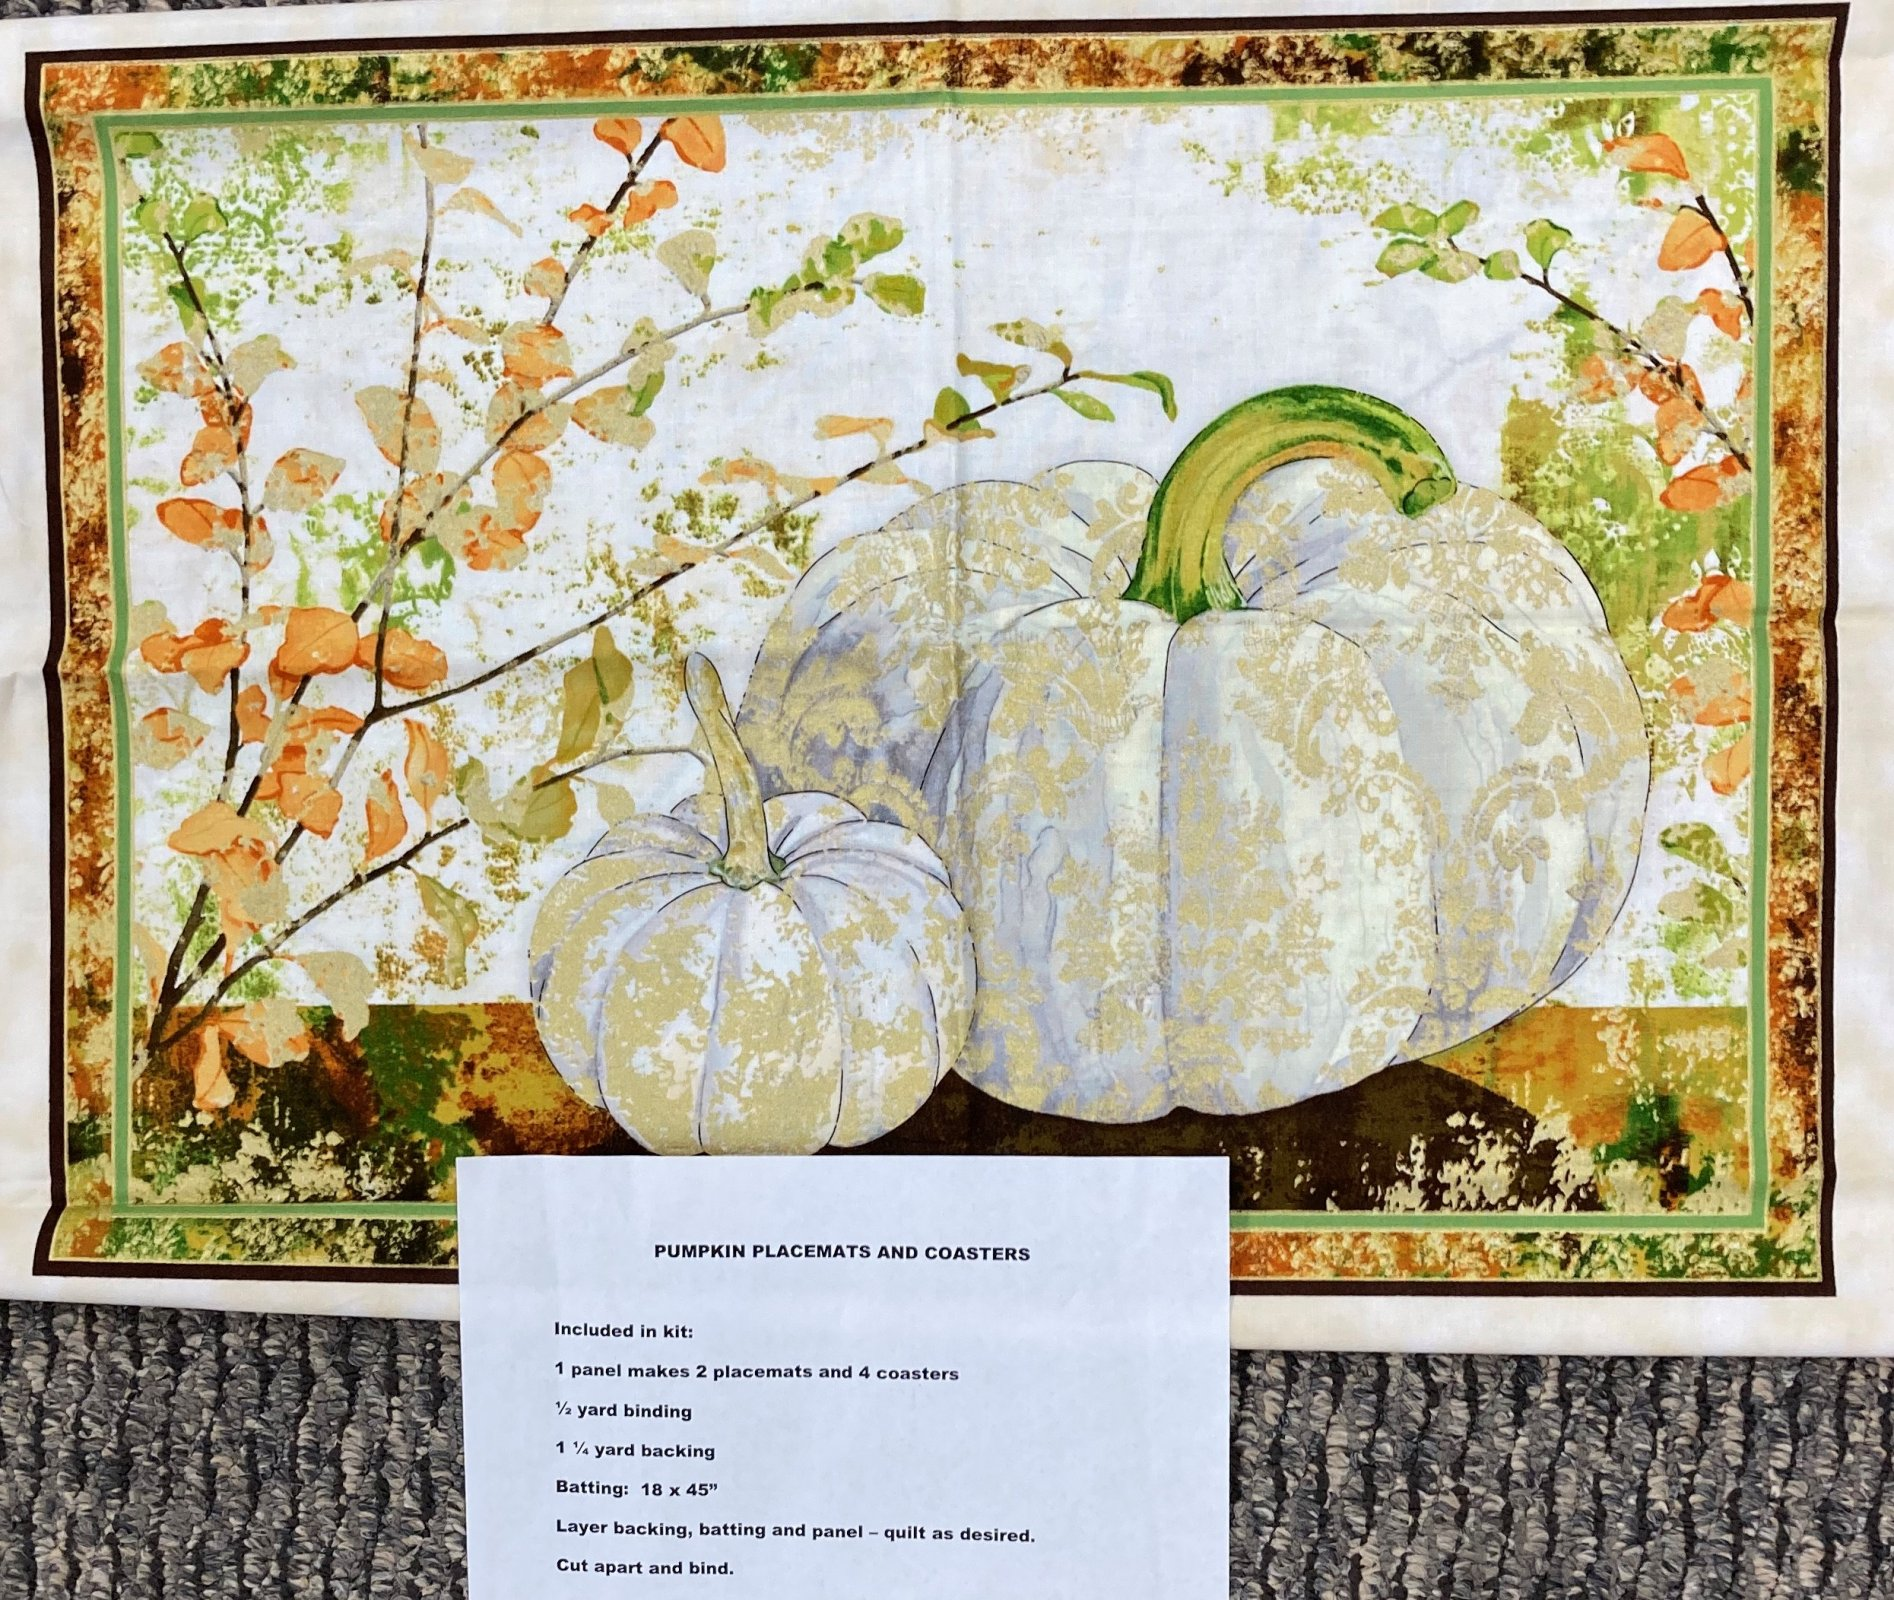 Pumpkin Placemats (2) and Coaster Kit